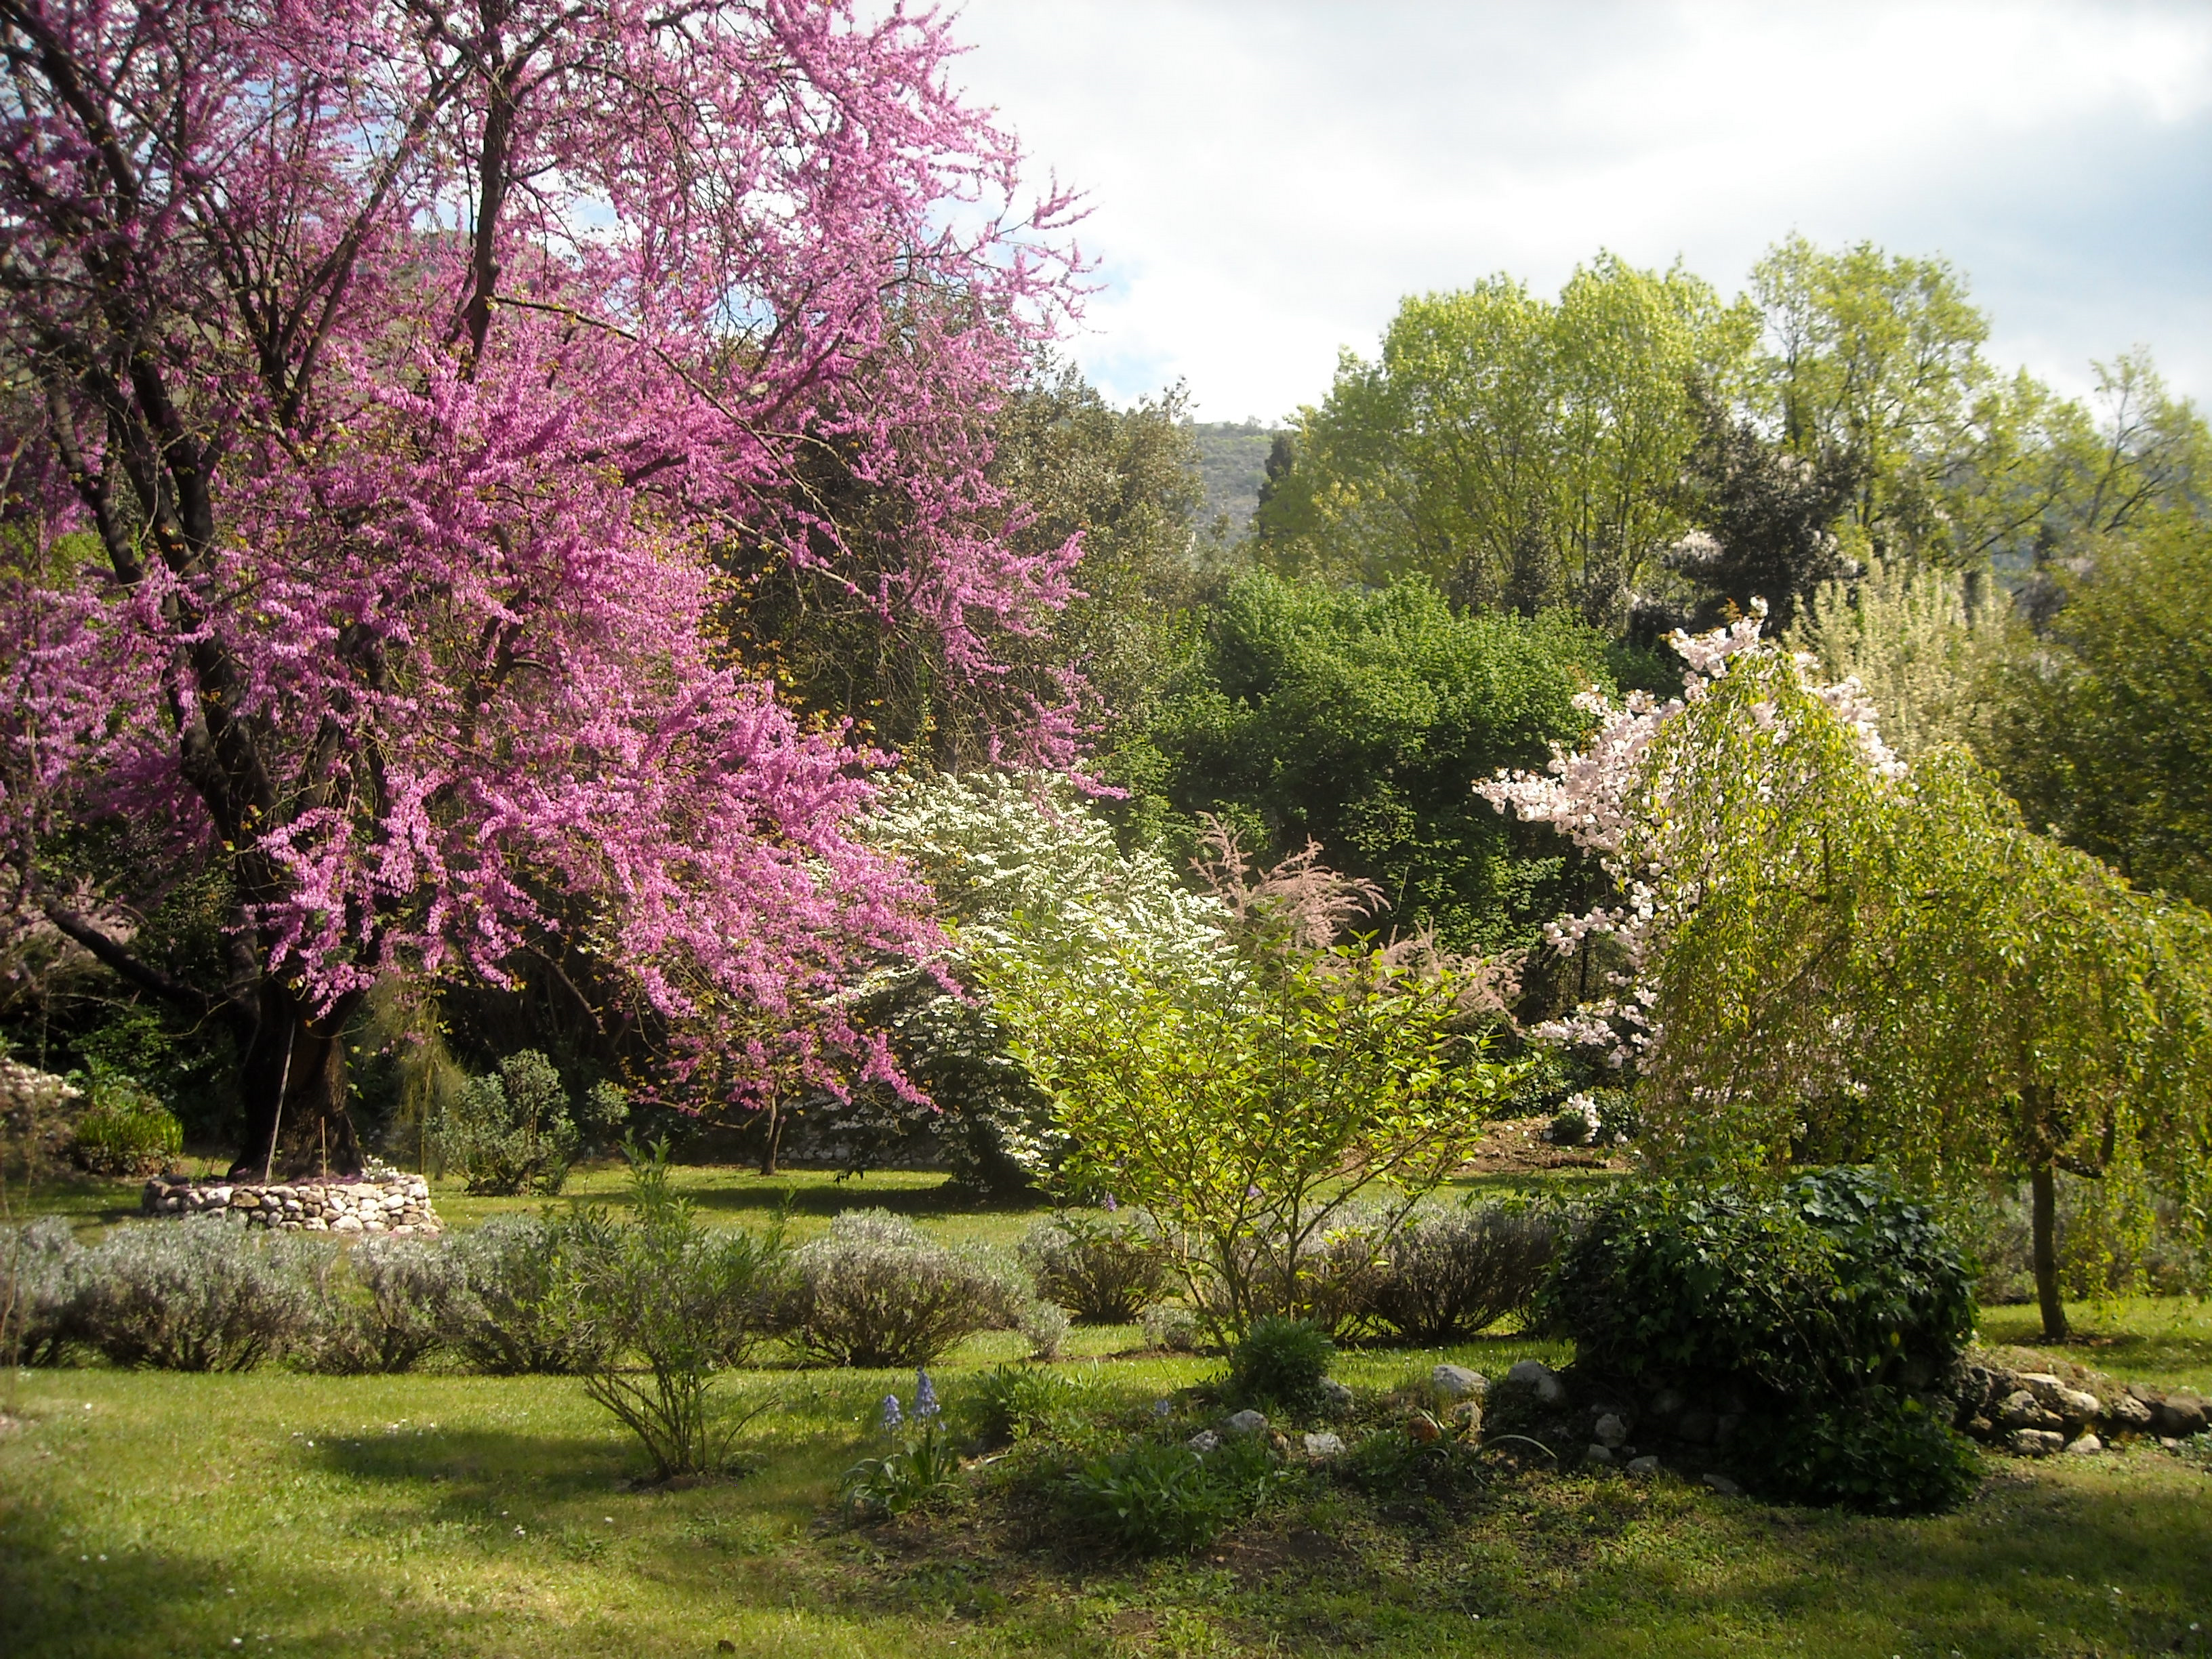 I giardini di ninfa e sermoneta associazione la castellina - I giardini di ninfa ...